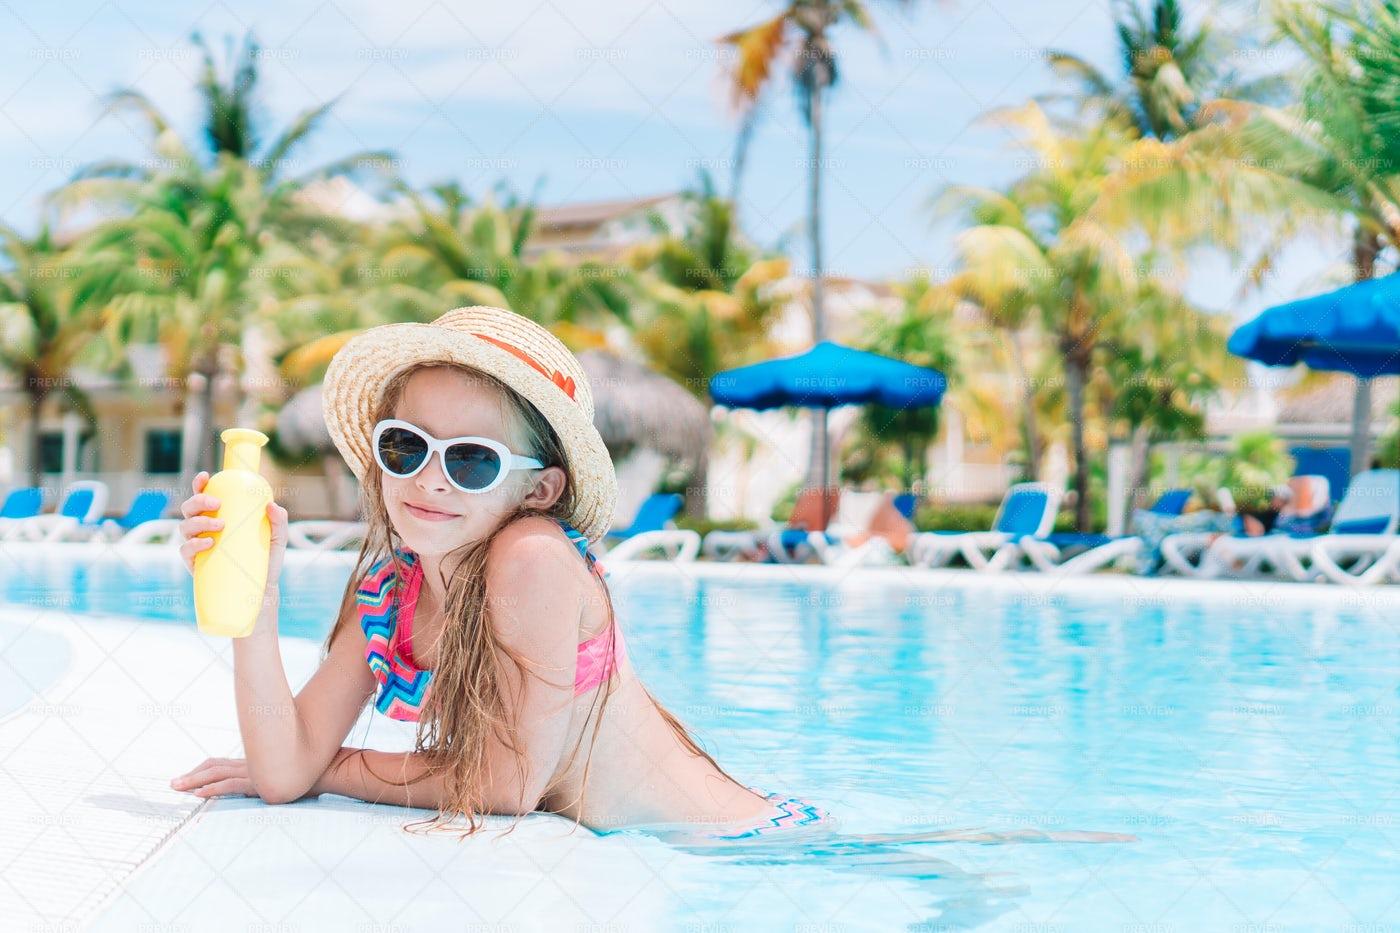 Little Girl With Bottle Of Sun Cream: Stock Photos